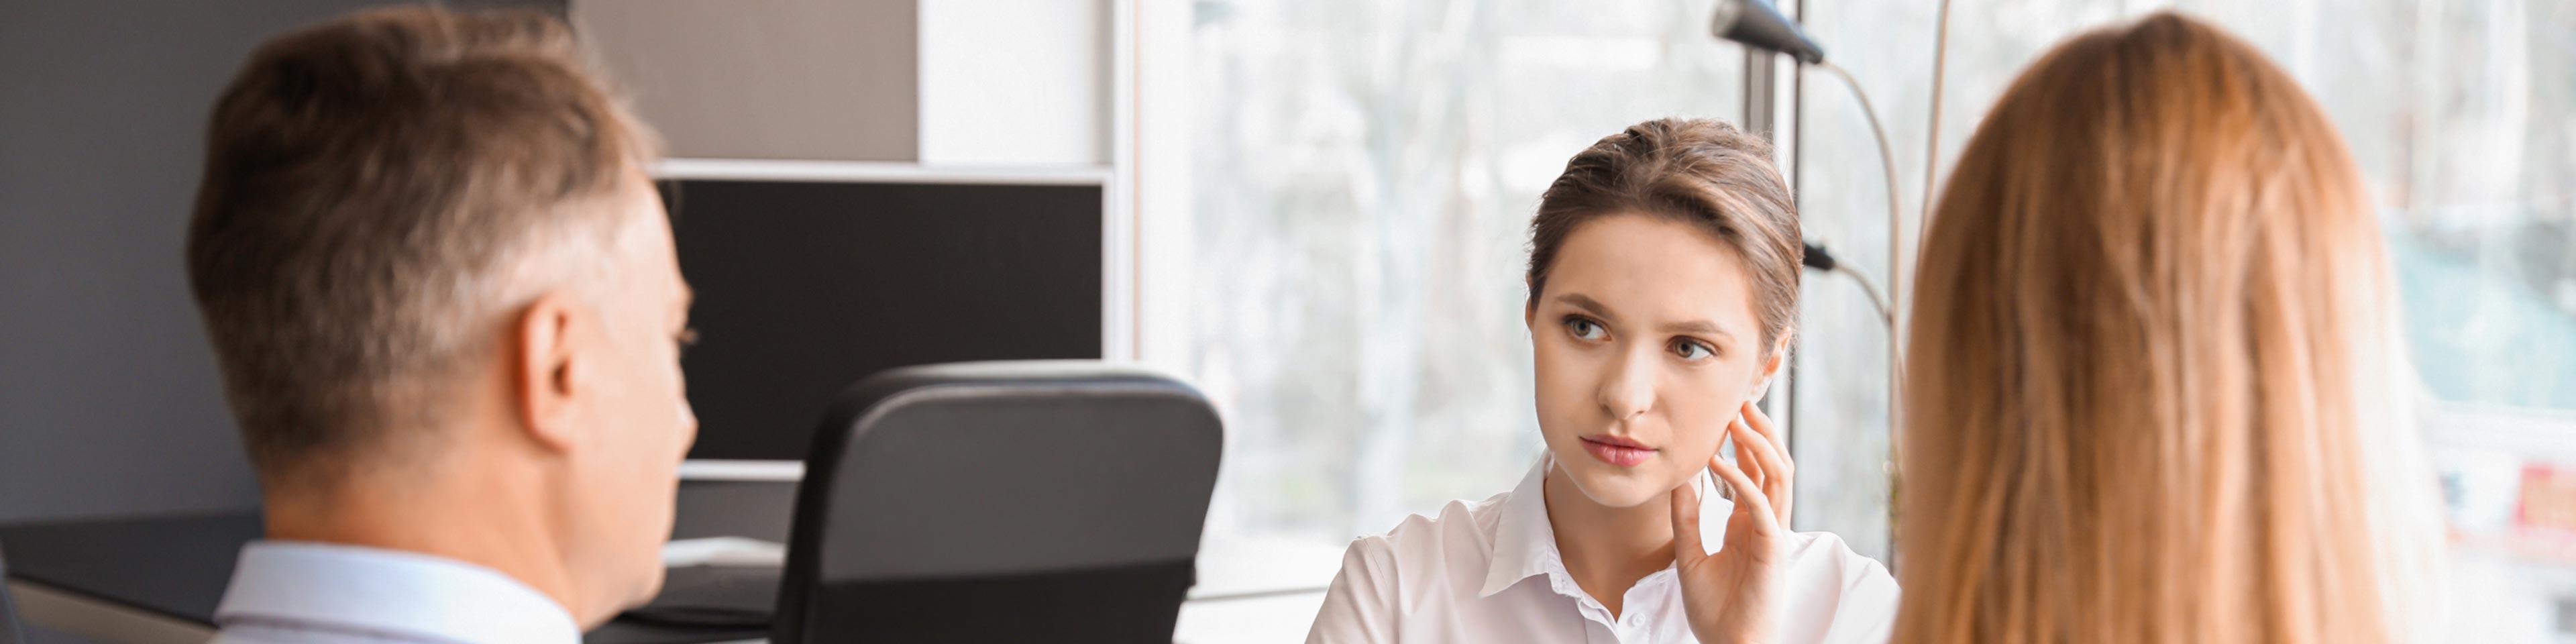 supervisor deciding whether to give employees raises